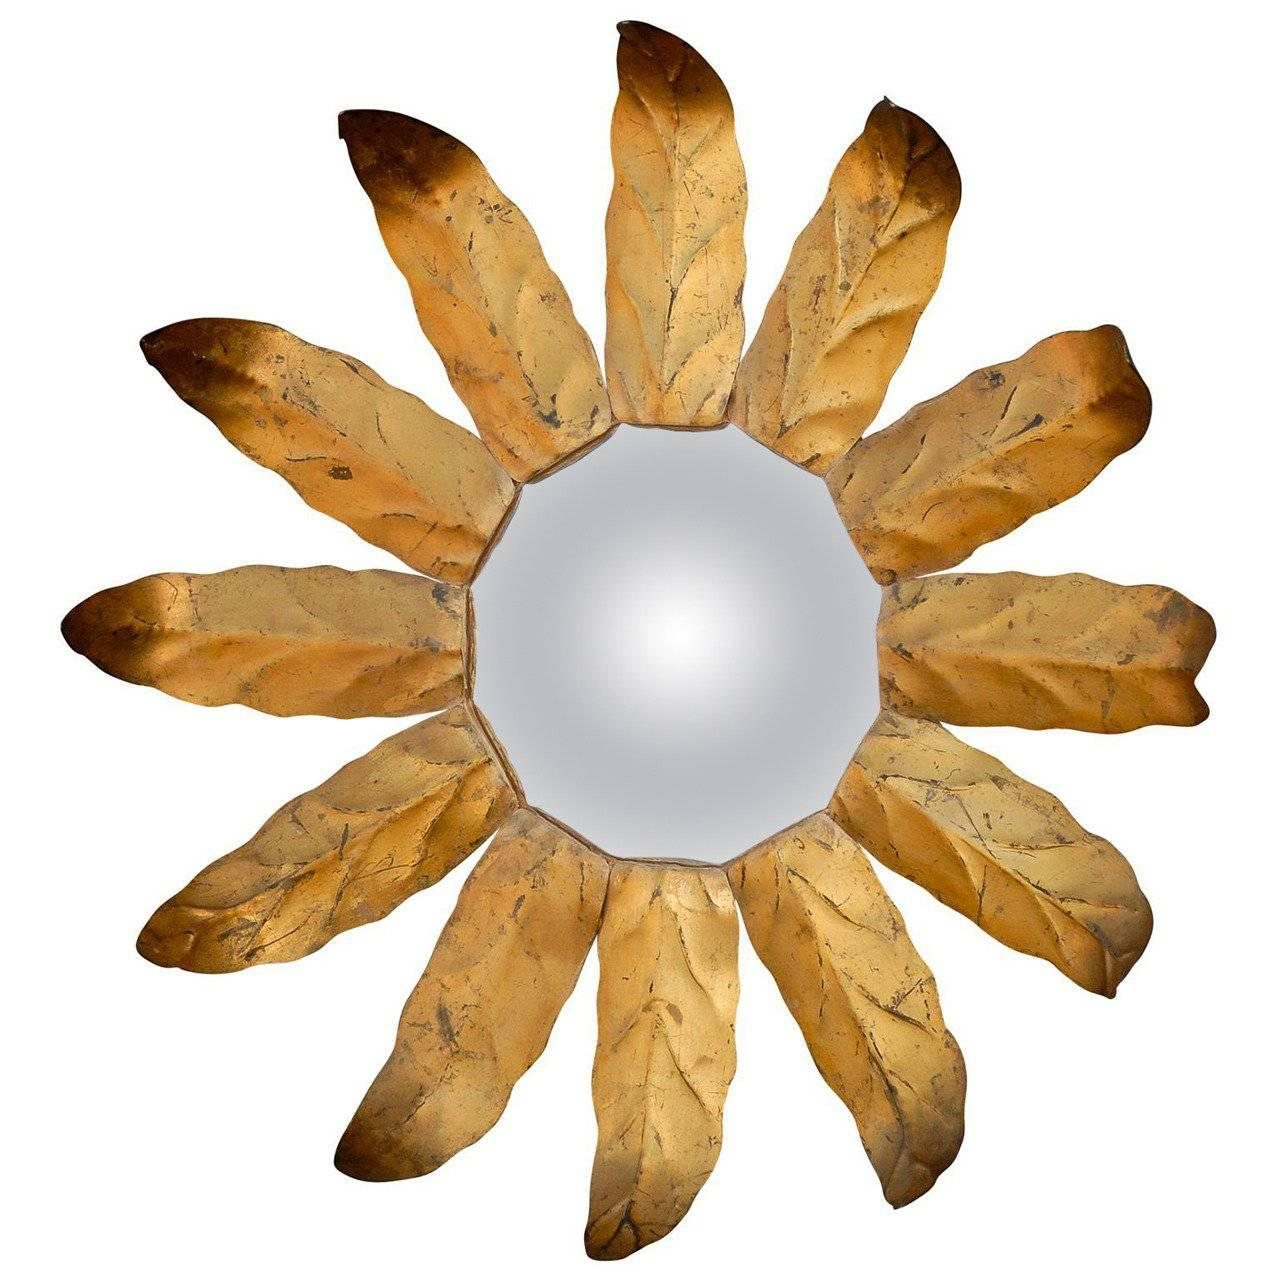 1940s Spanish Sunburst Mirror with Darkened Gilt Metal Leaves and Convex Glass